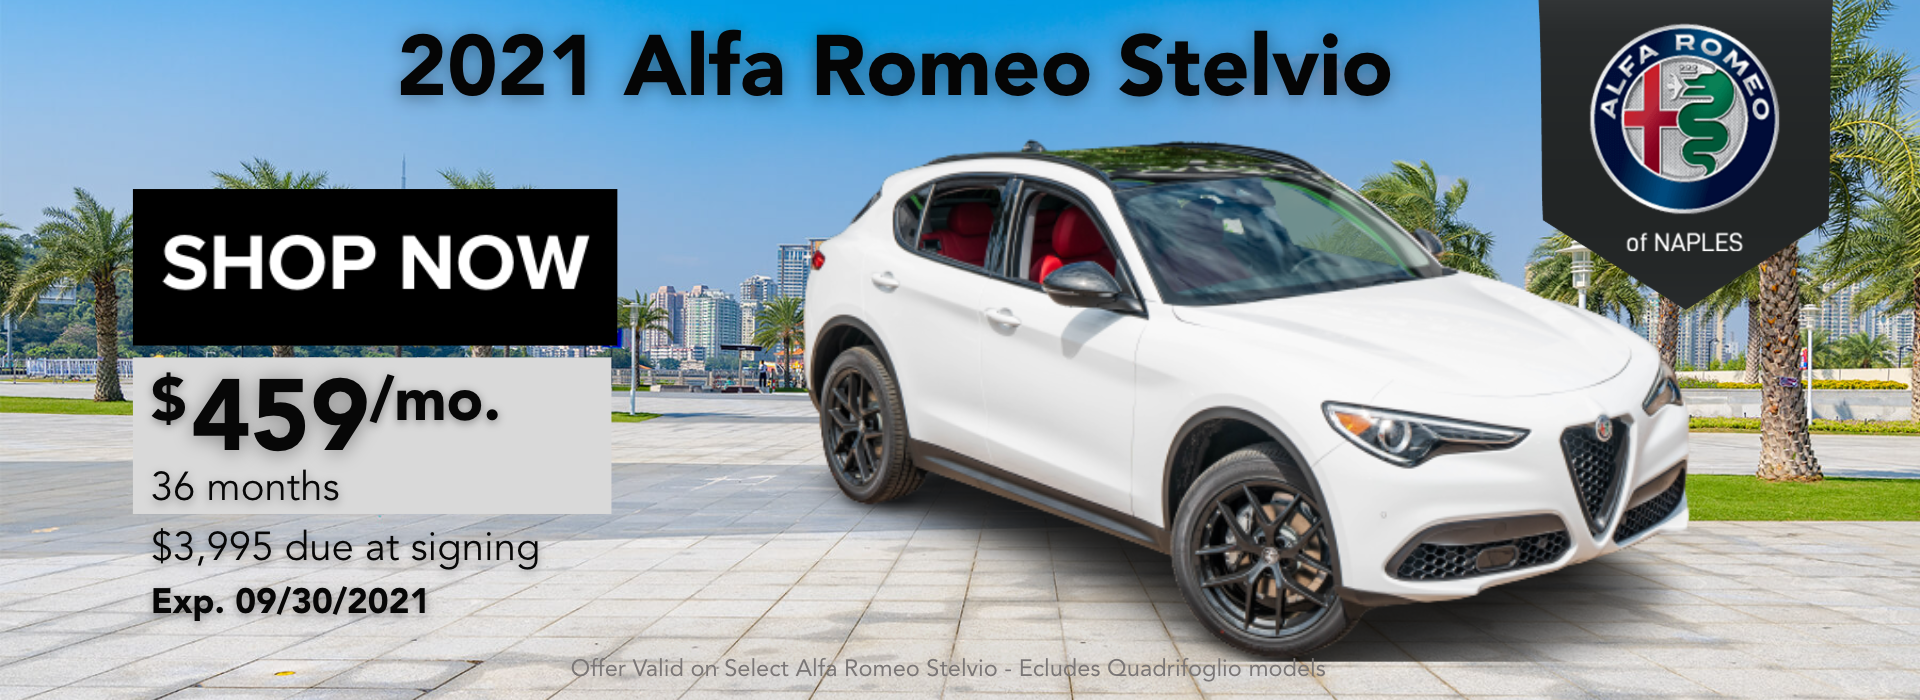 2021_Alfa Romeo_Stelvio_Quadrifoglio_Sat Sep 04 2021 09_08_16 GMT-0400 (Eastern Daylight Time)